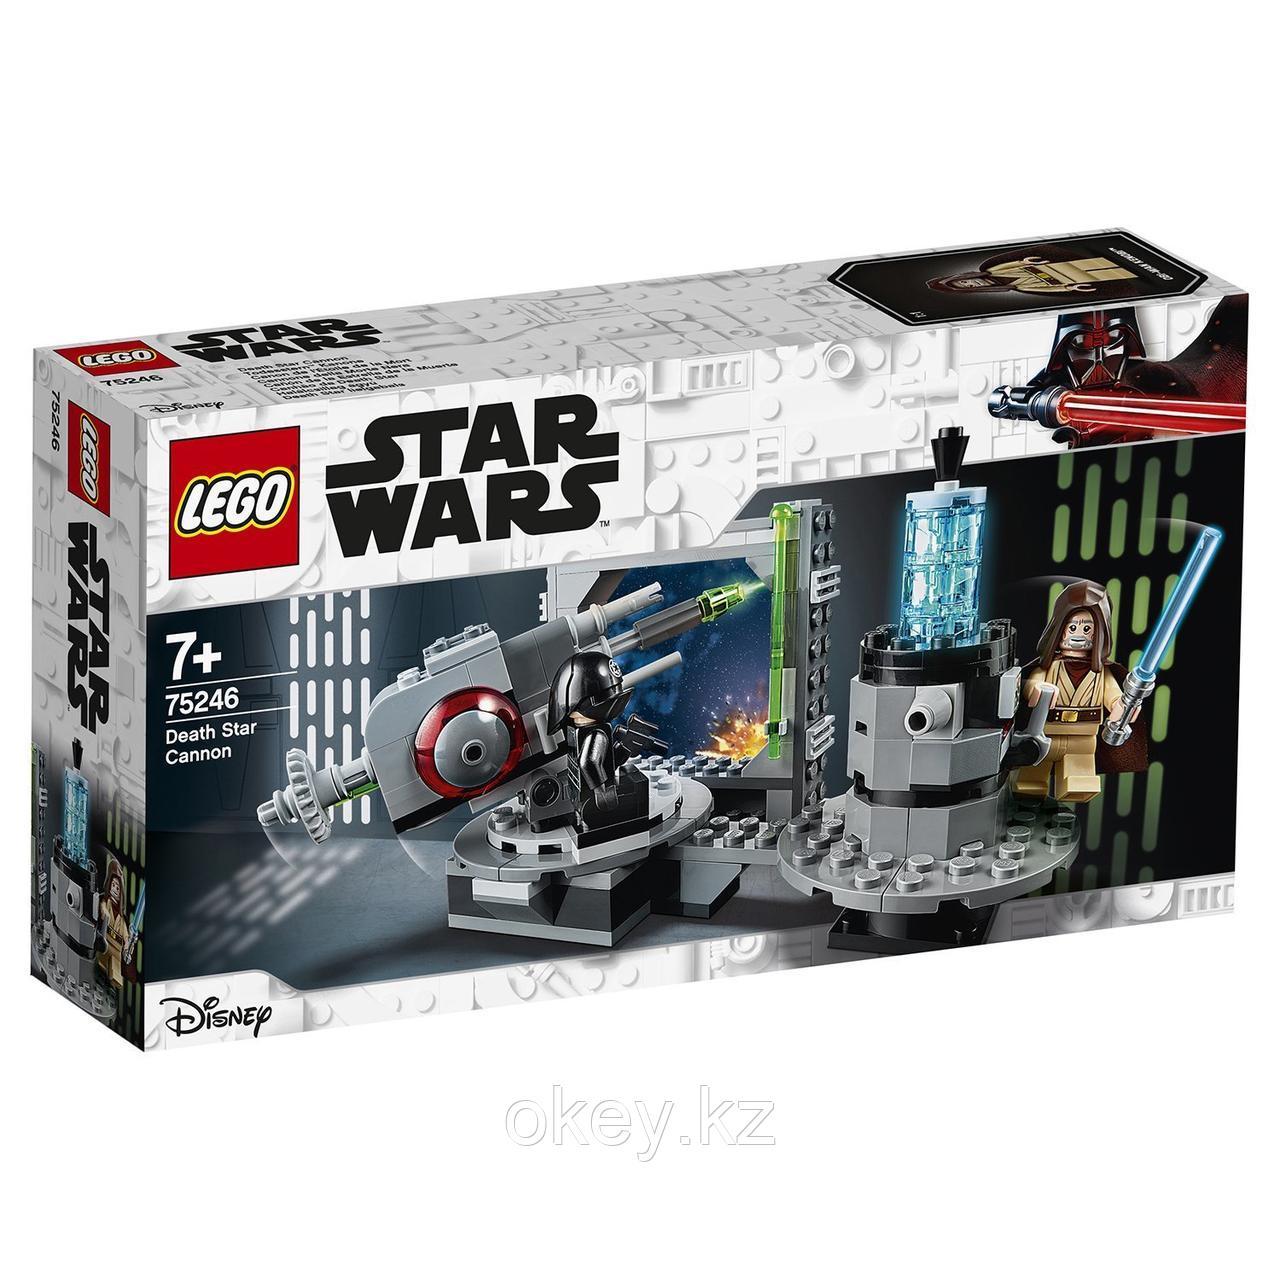 LEGO Star Wars: Пушка Звезды смерти 75246